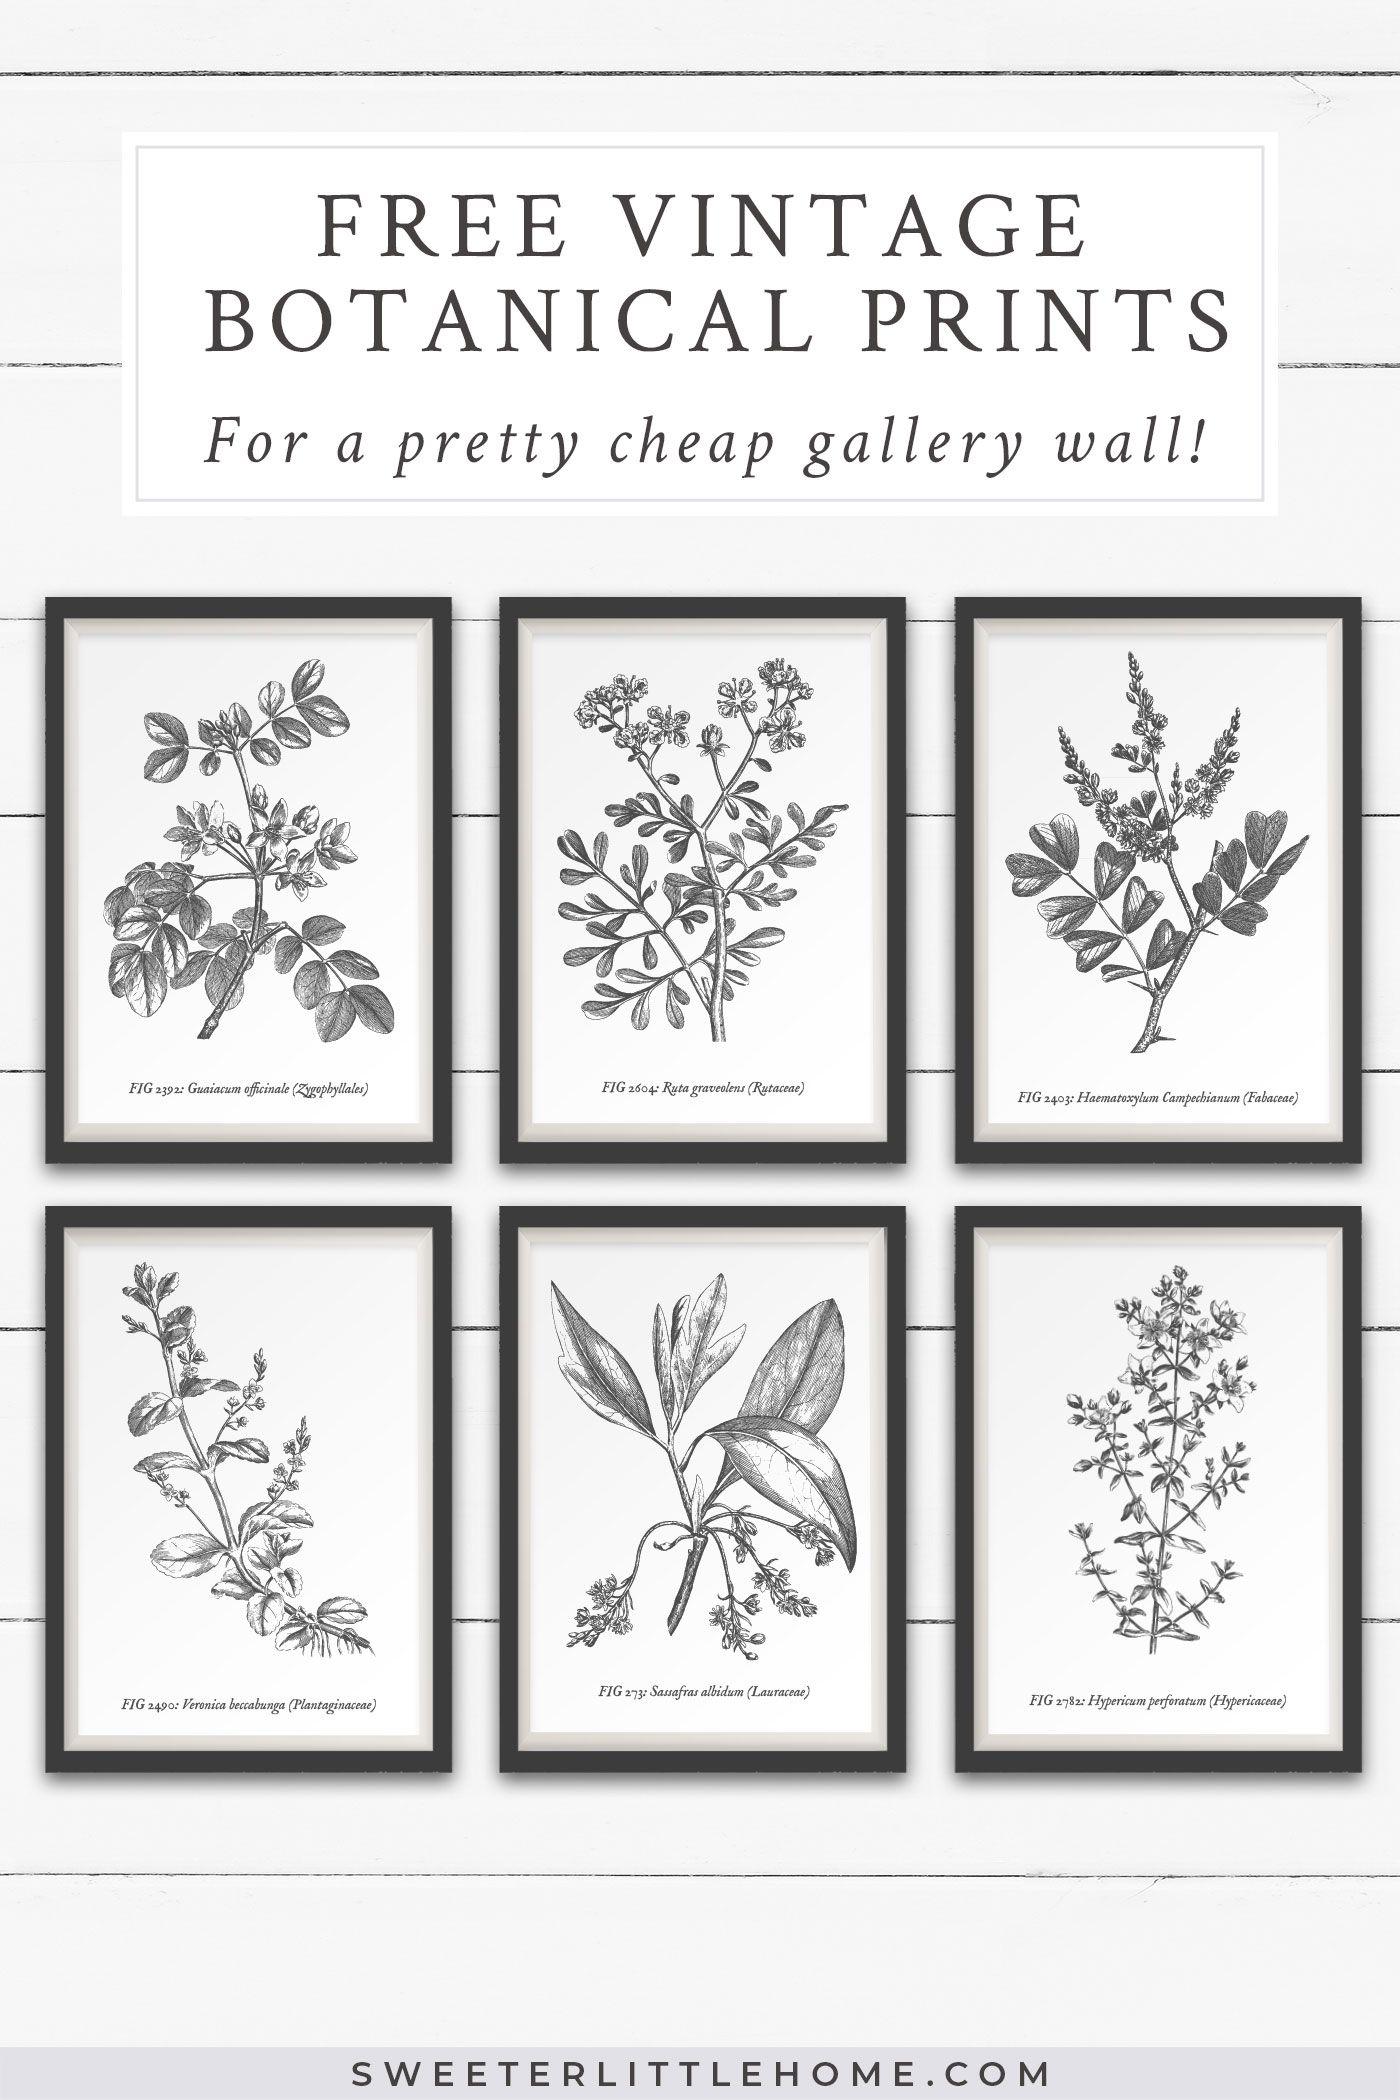 Photo of Free vintage botanical prints wall art